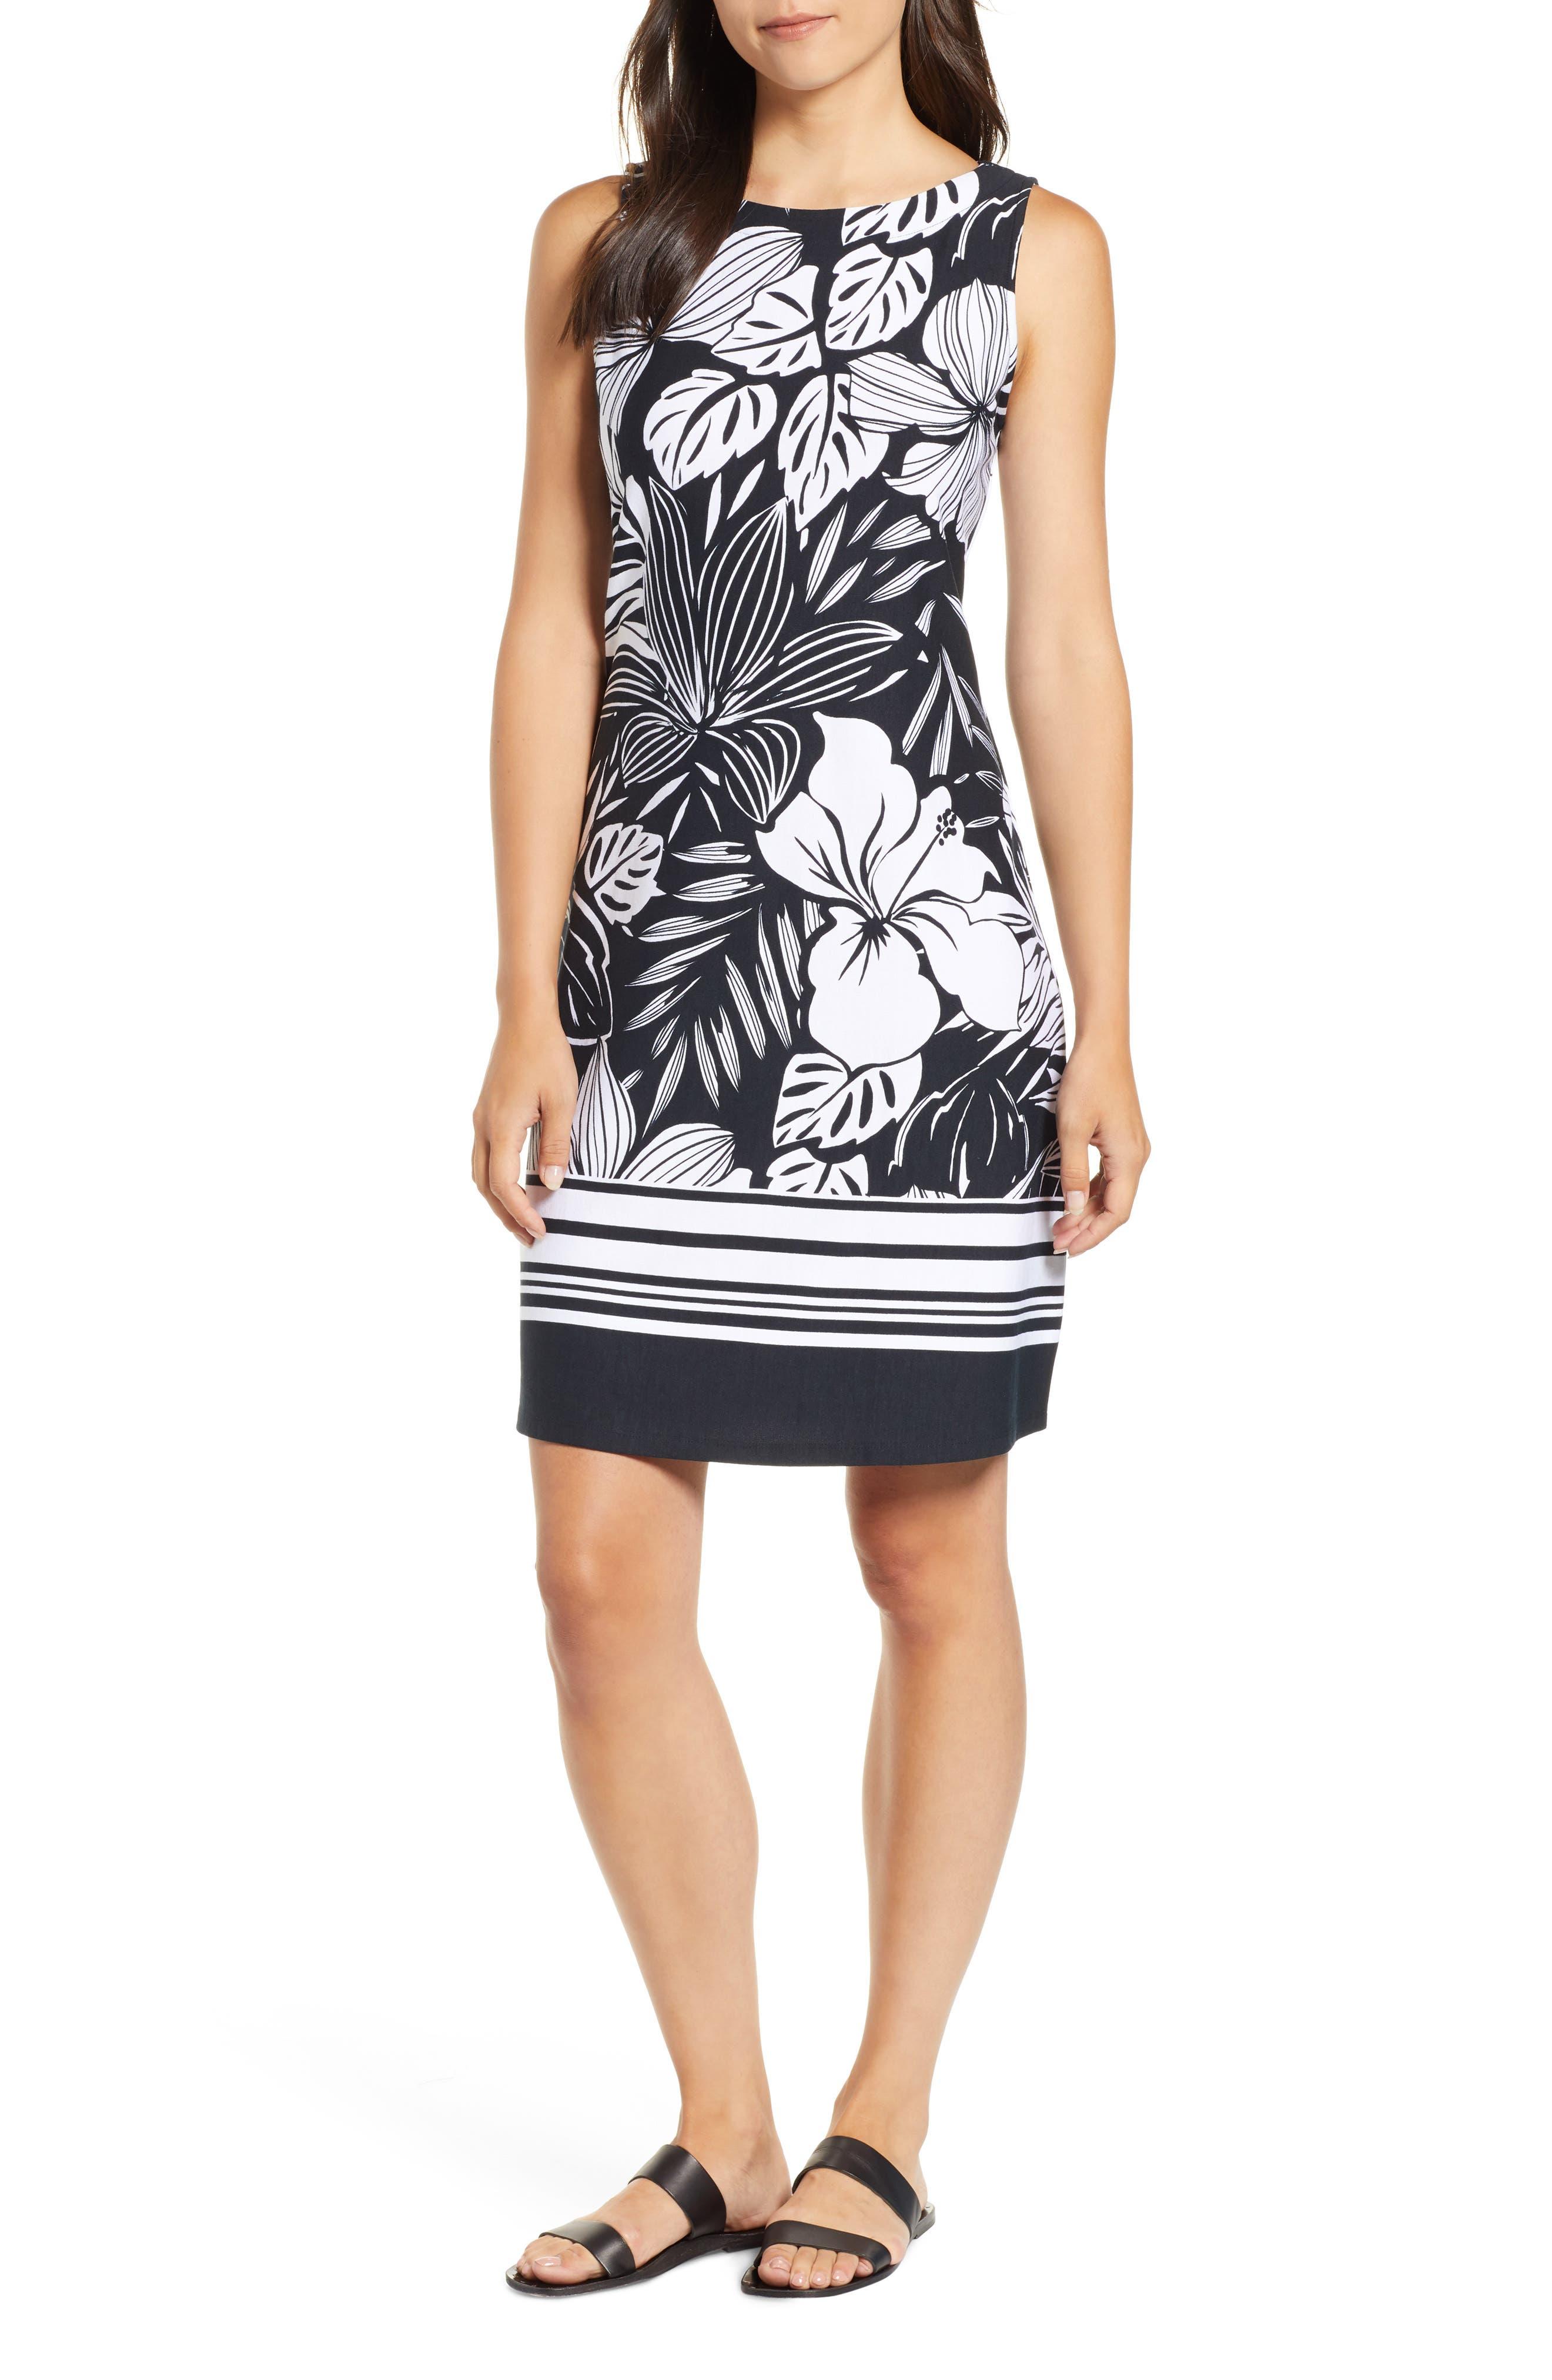 TOMMY BAHAMA Mahana Beach Floral Stripe Dress in Black